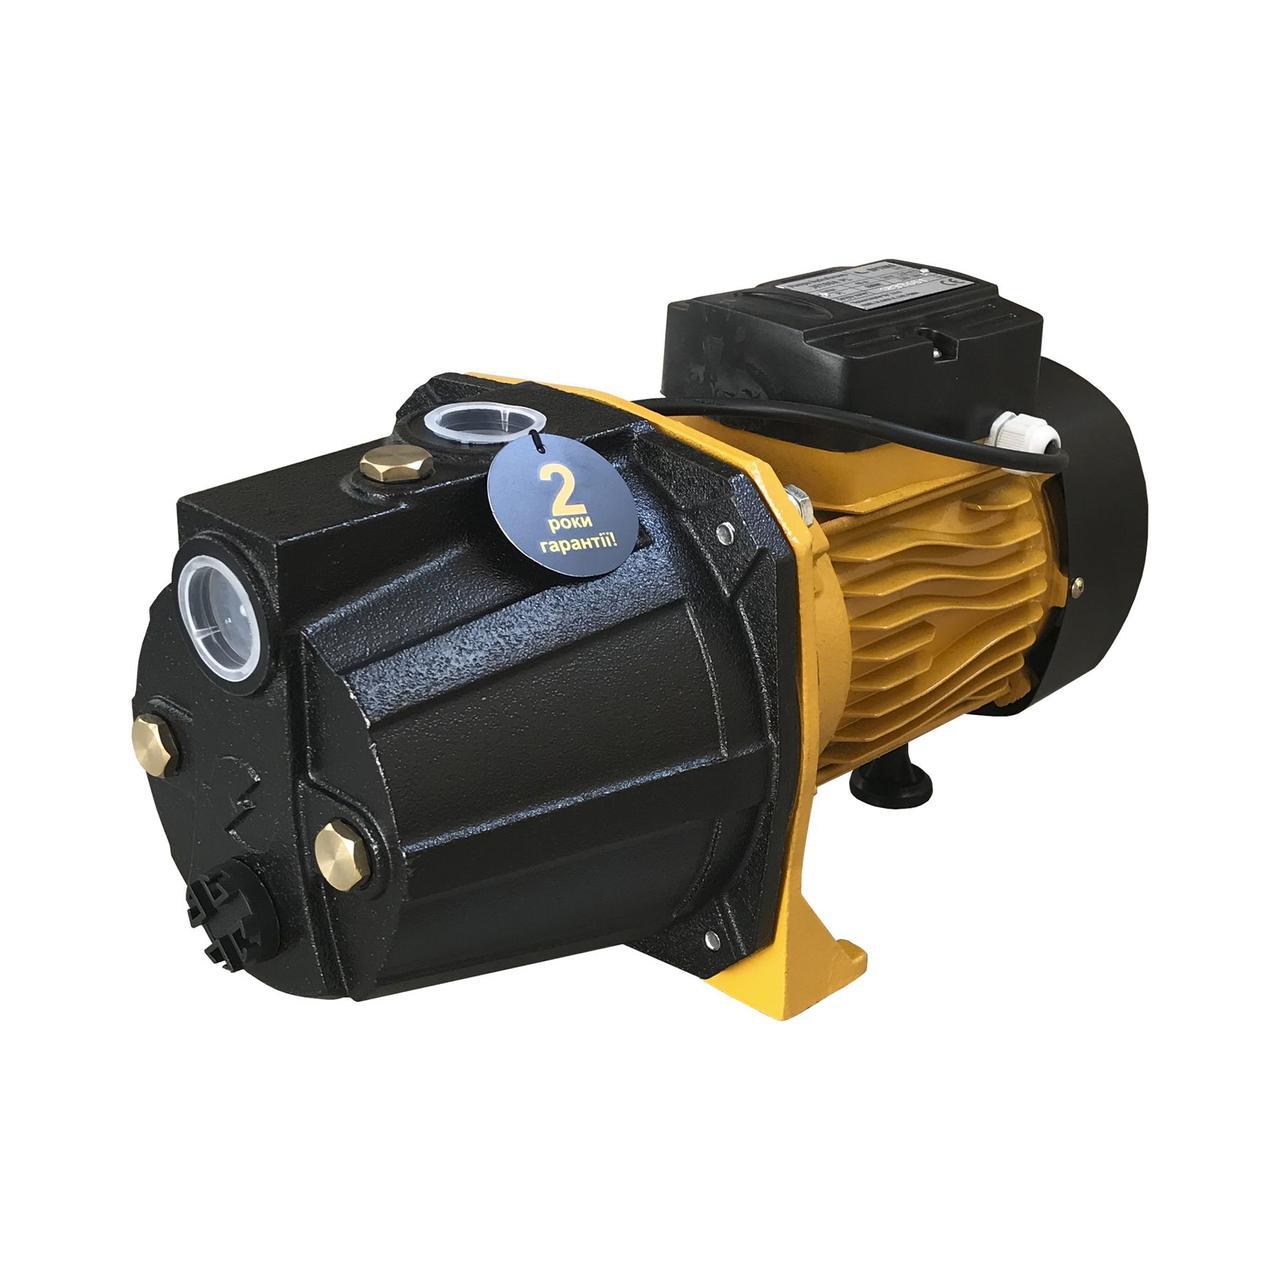 Насос центробежный Optima JET80A 0,8 кВт чугун короткий